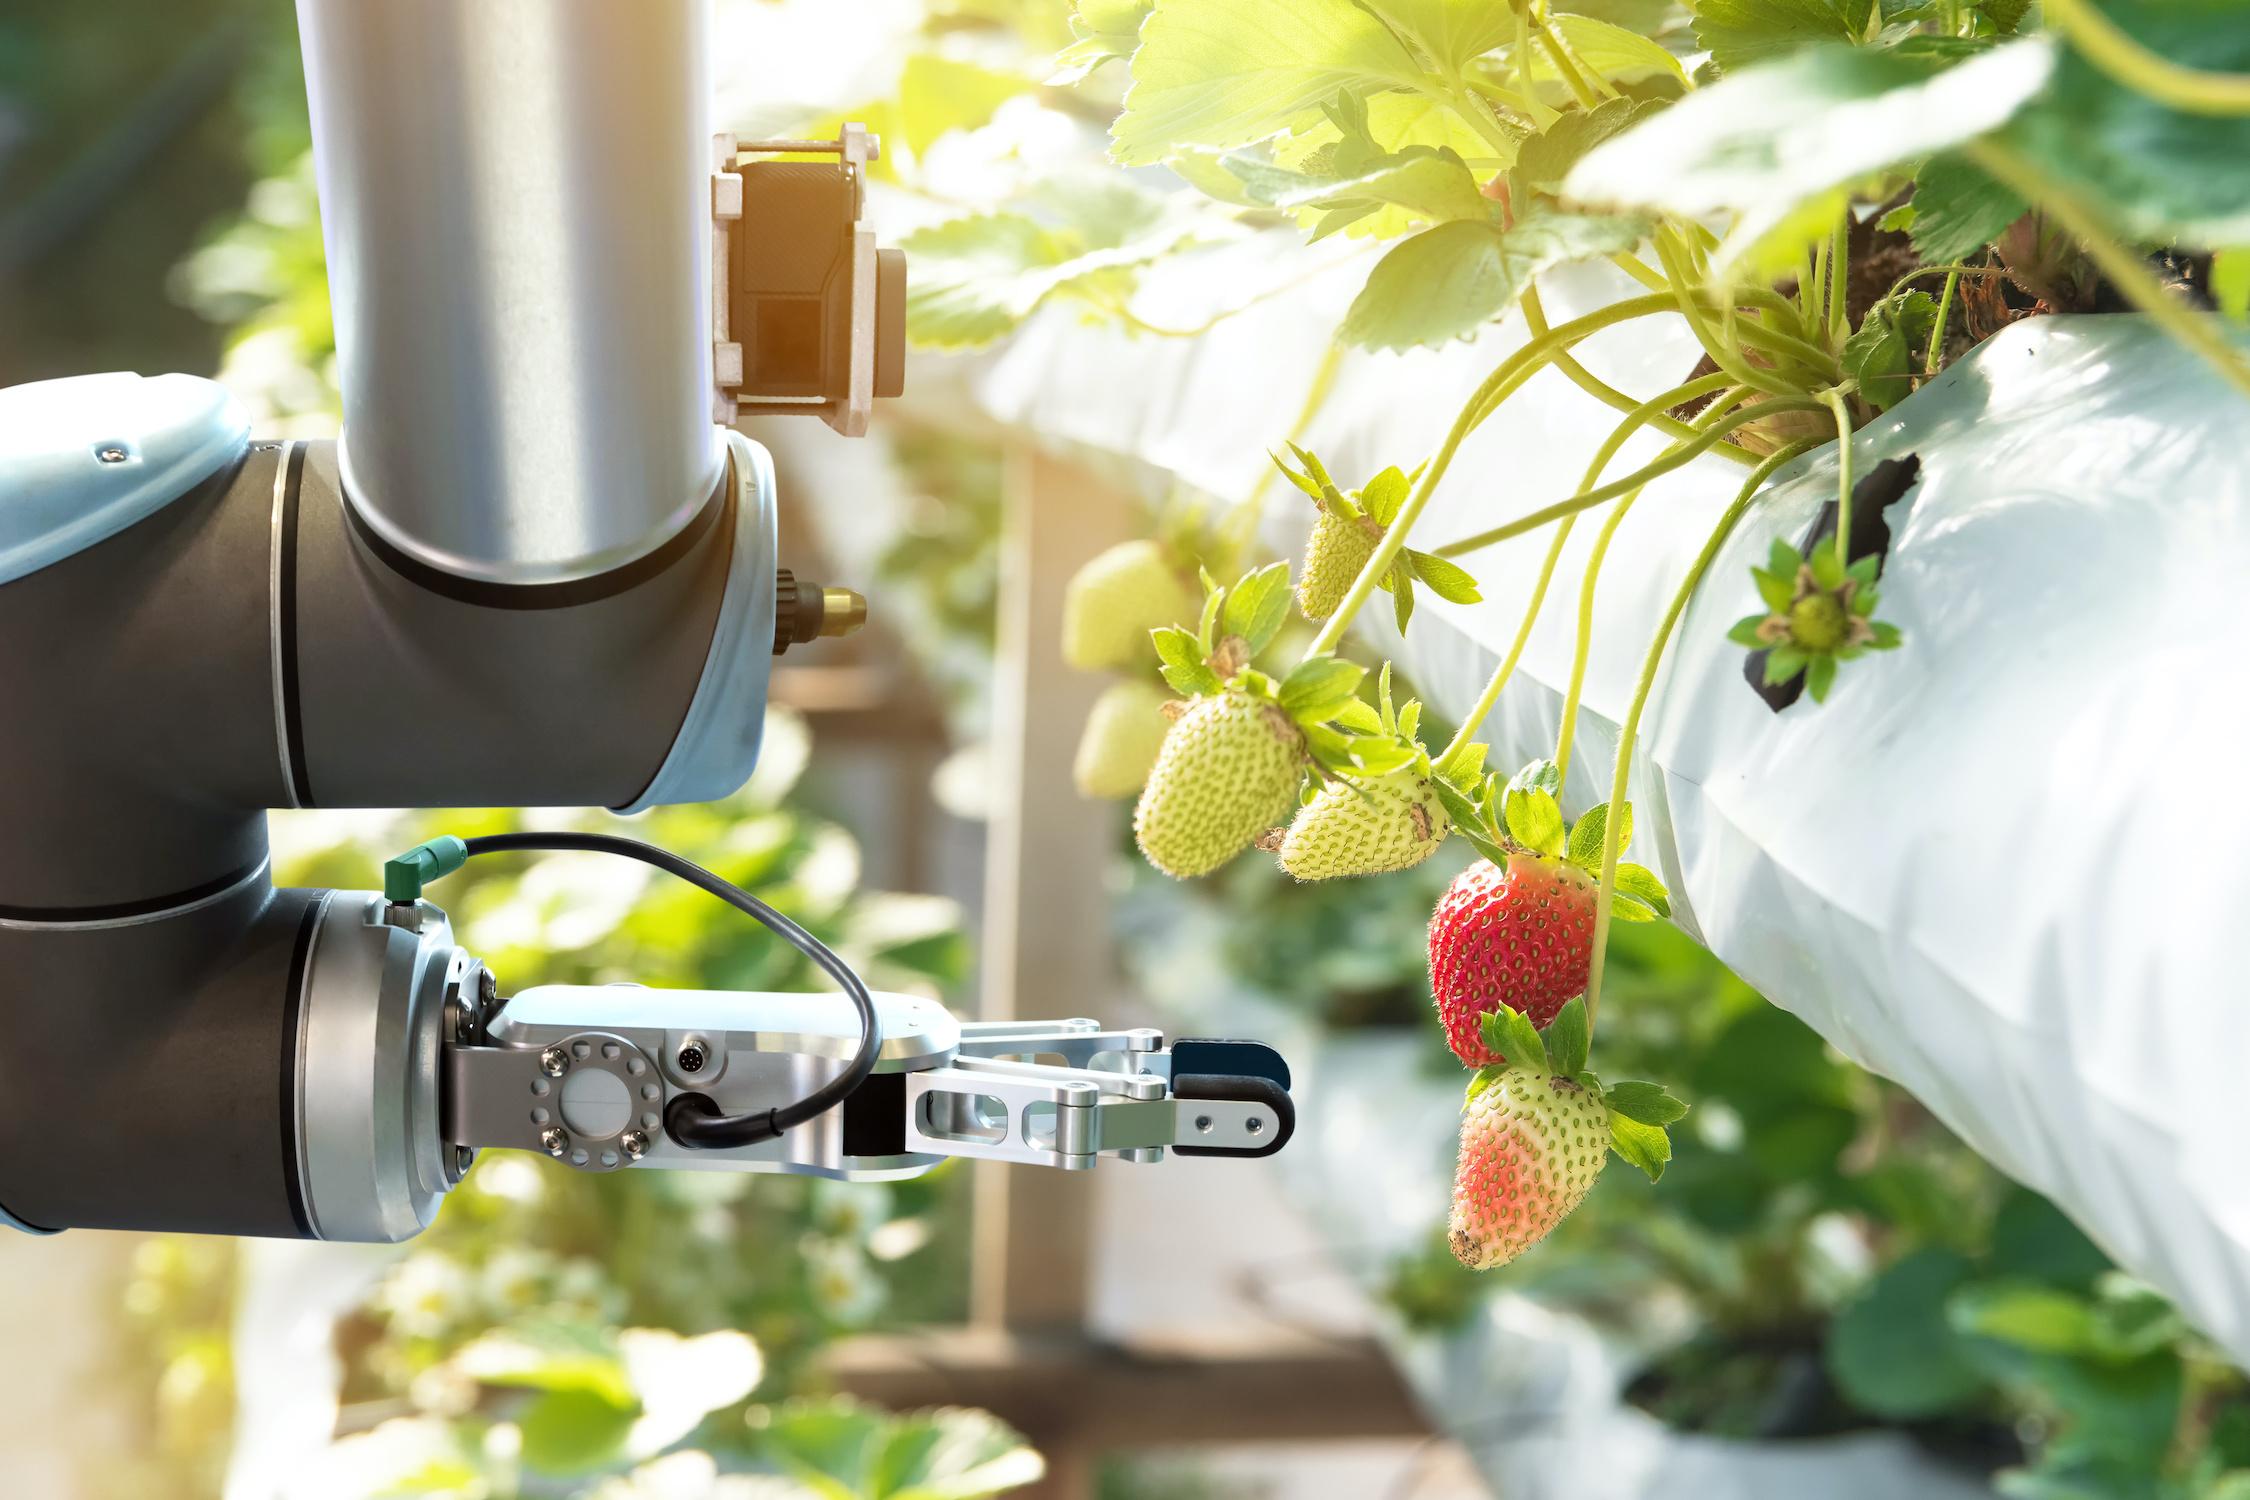 The Digital Future of Farming – Evolution against Obsolescence